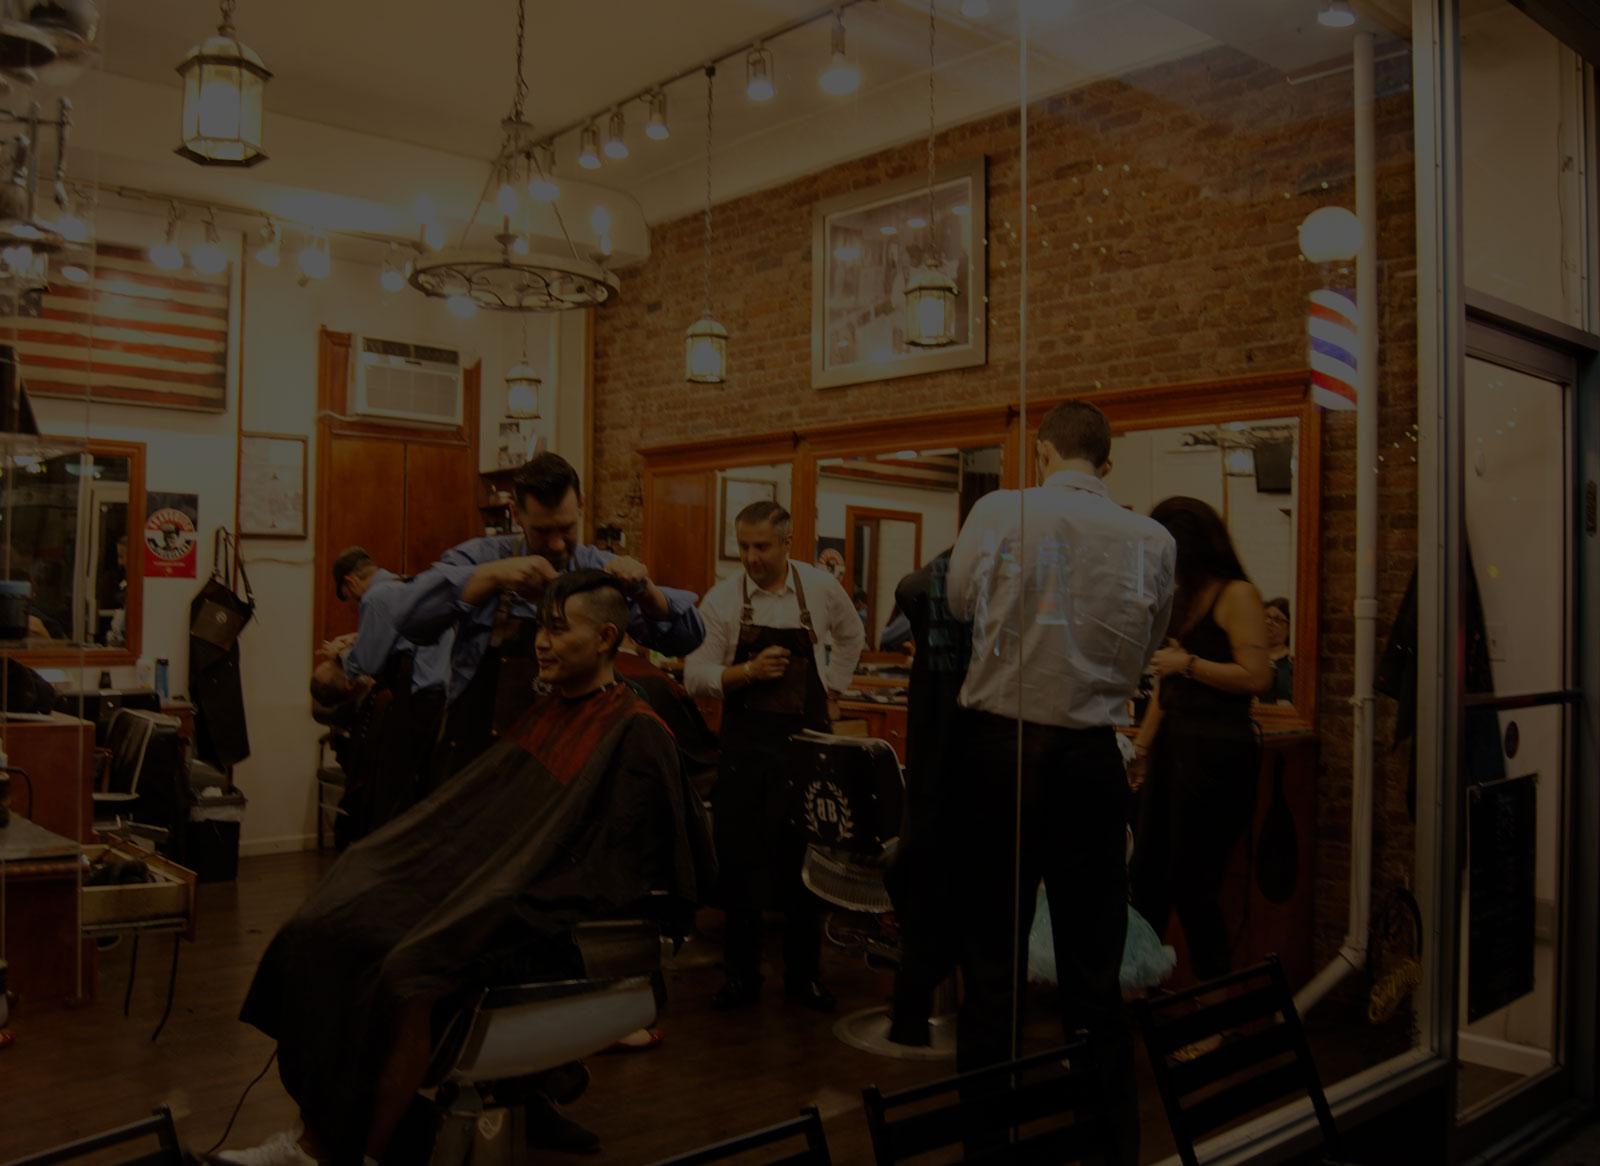 Barbers blueprint nyc barbers blueprint nyc 181 mulberry st 10012 barbers blueprint nyc malvernweather Images